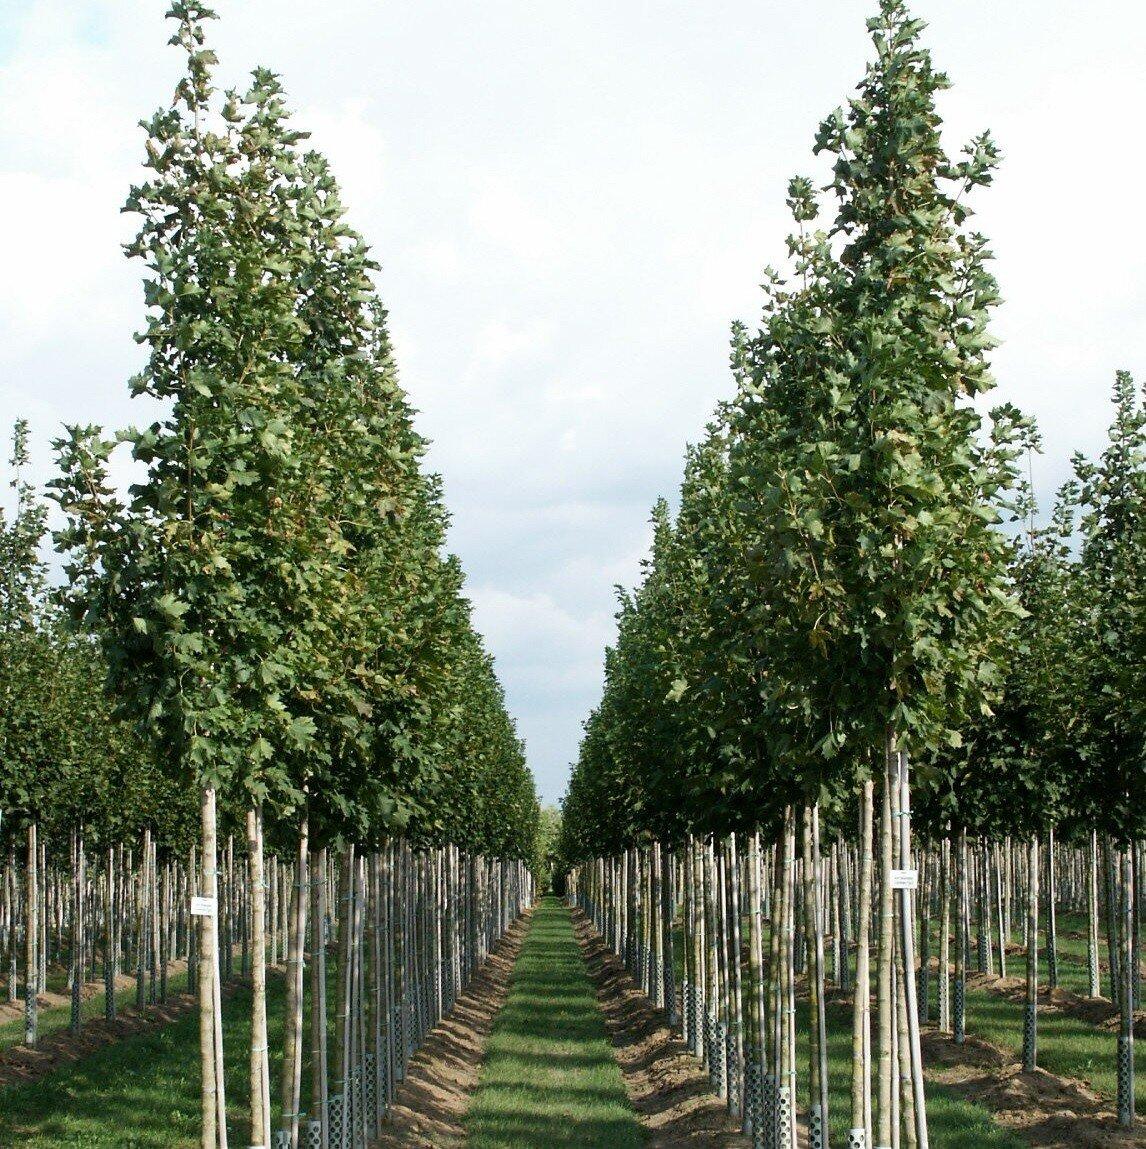 Noorse esdoorn (Acer platanoides)